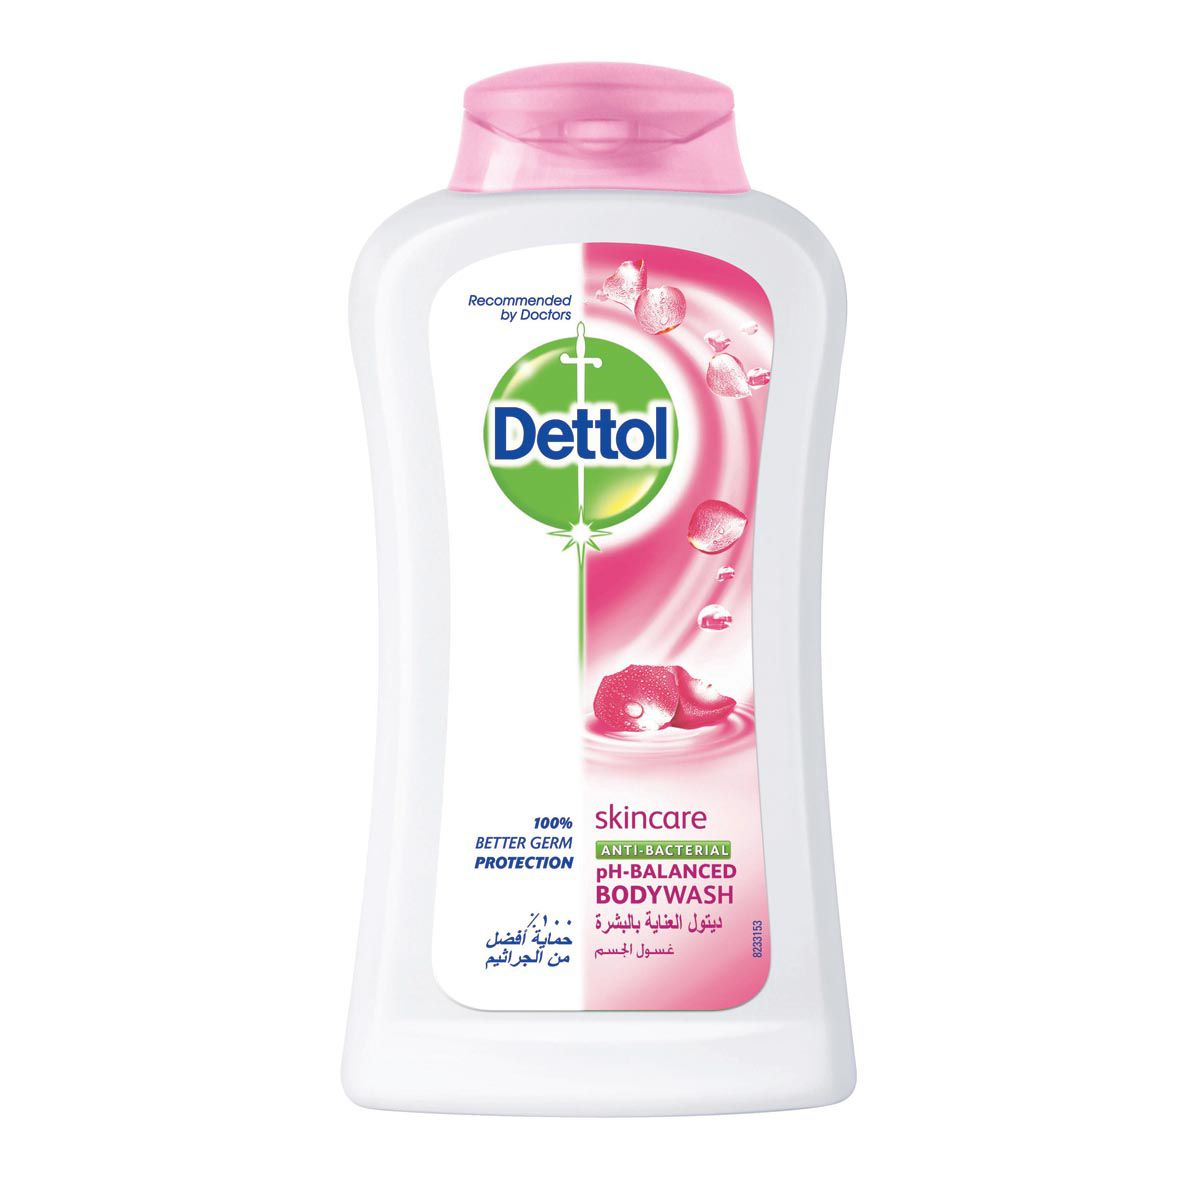 Dettol Antibacterial Ph Balanced Body Wash Dettol